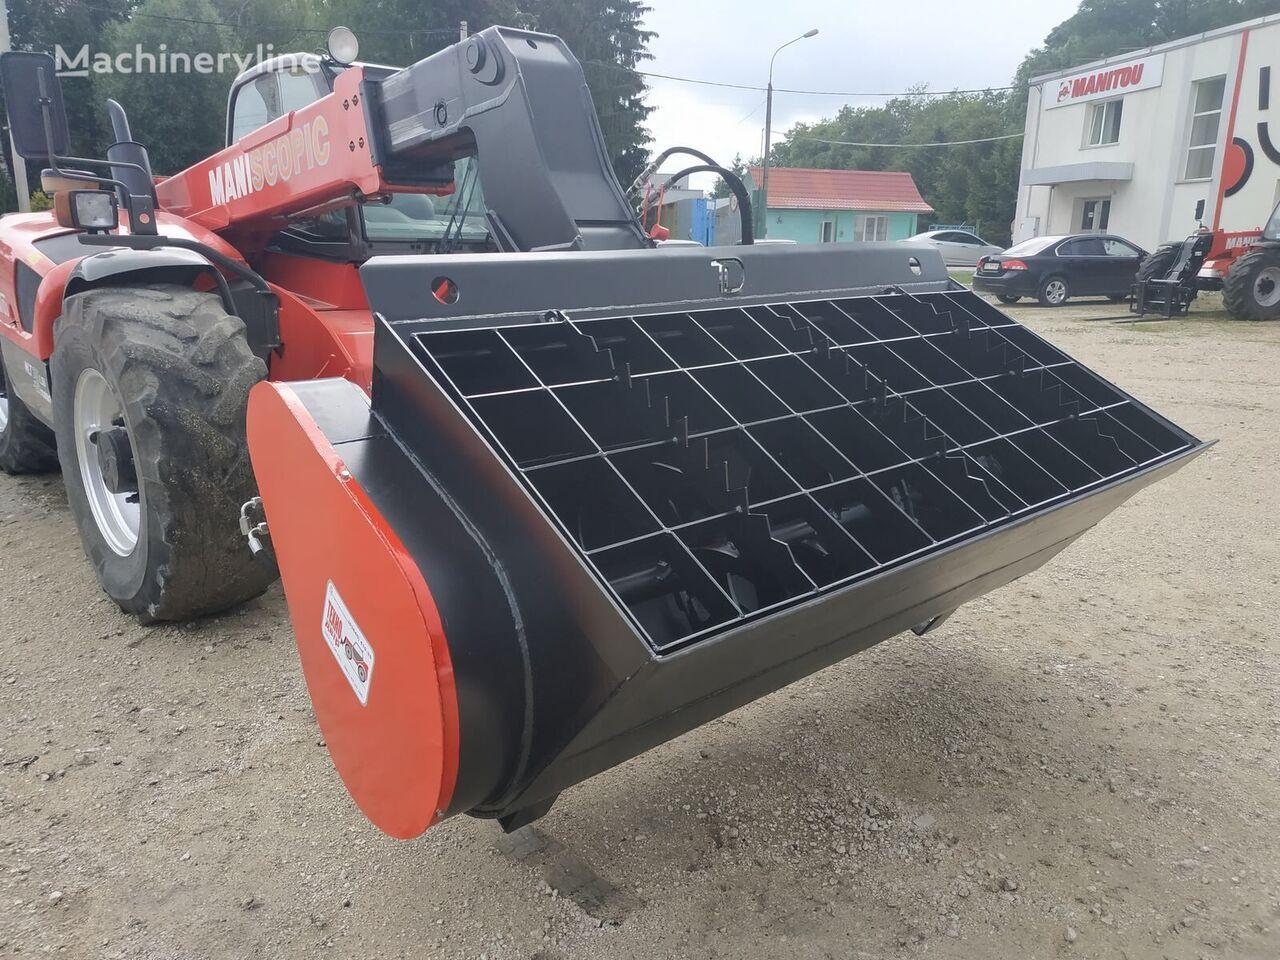 new MANITOU Kovsh-mikser kovsh - betonomeshalka concrete mixing bucket